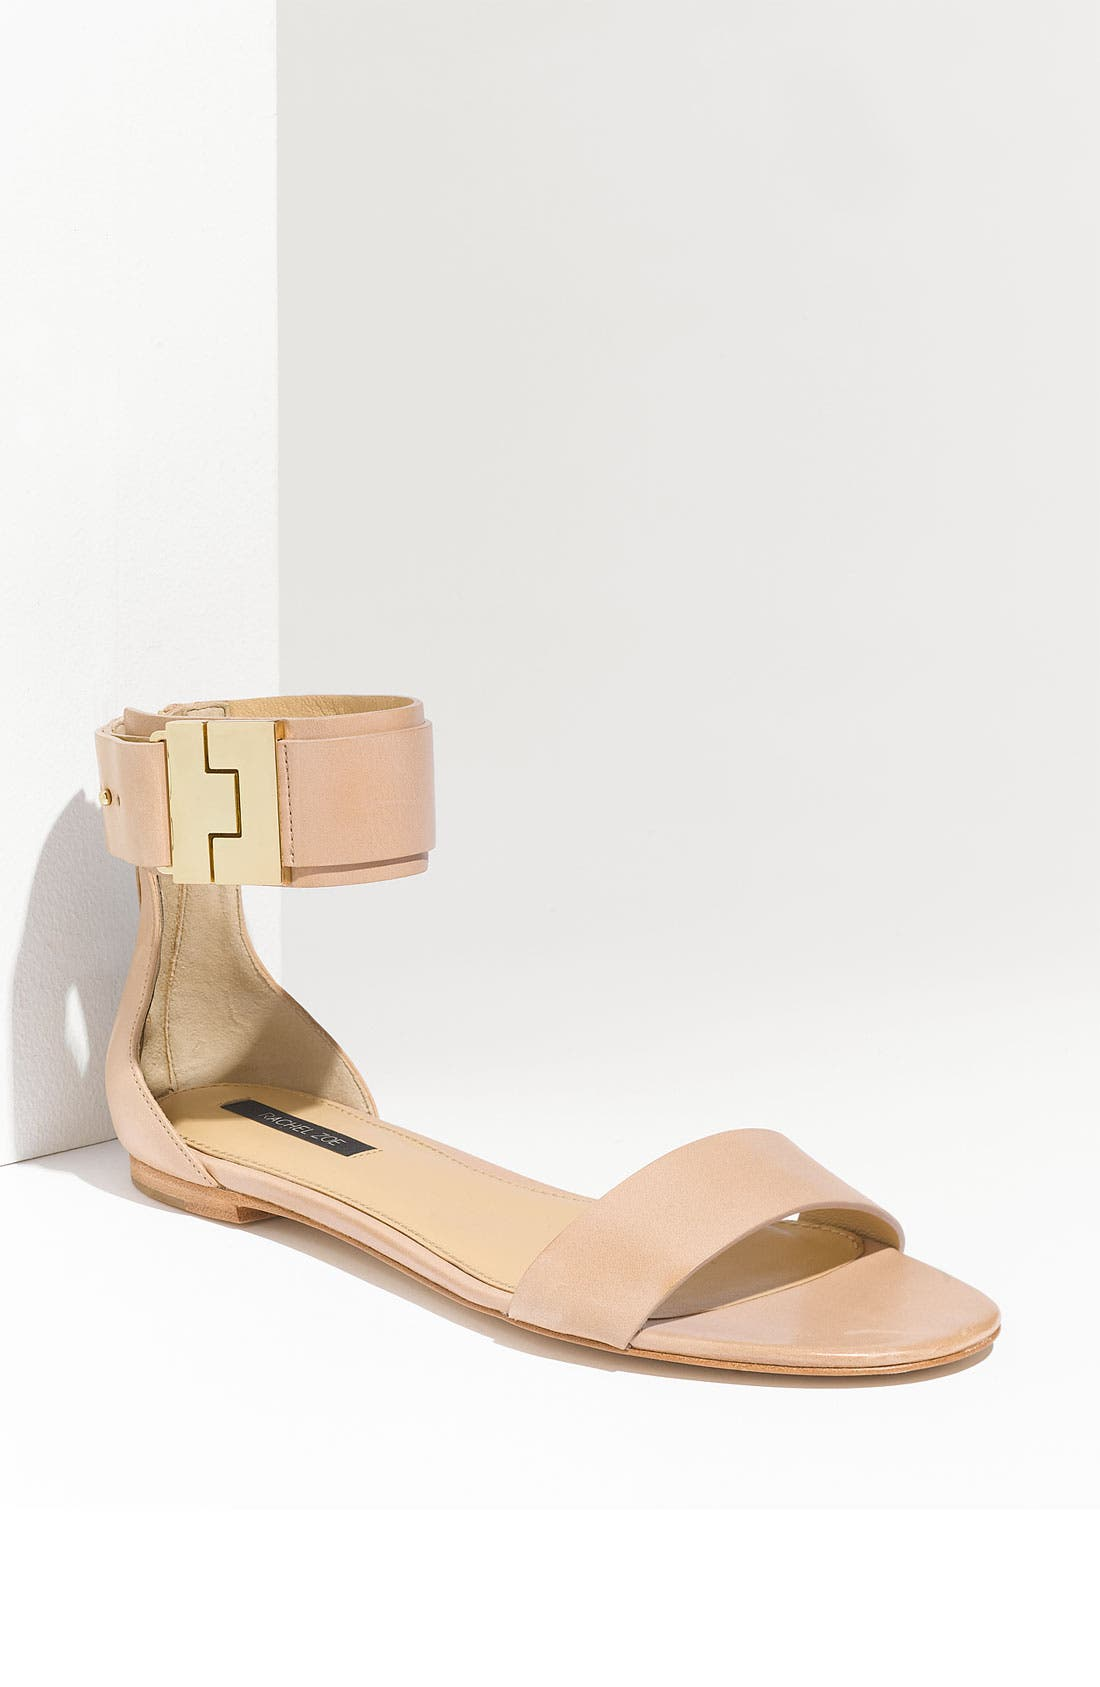 Main Image - Rachel Zoe 'Gladys' Flat Sandal